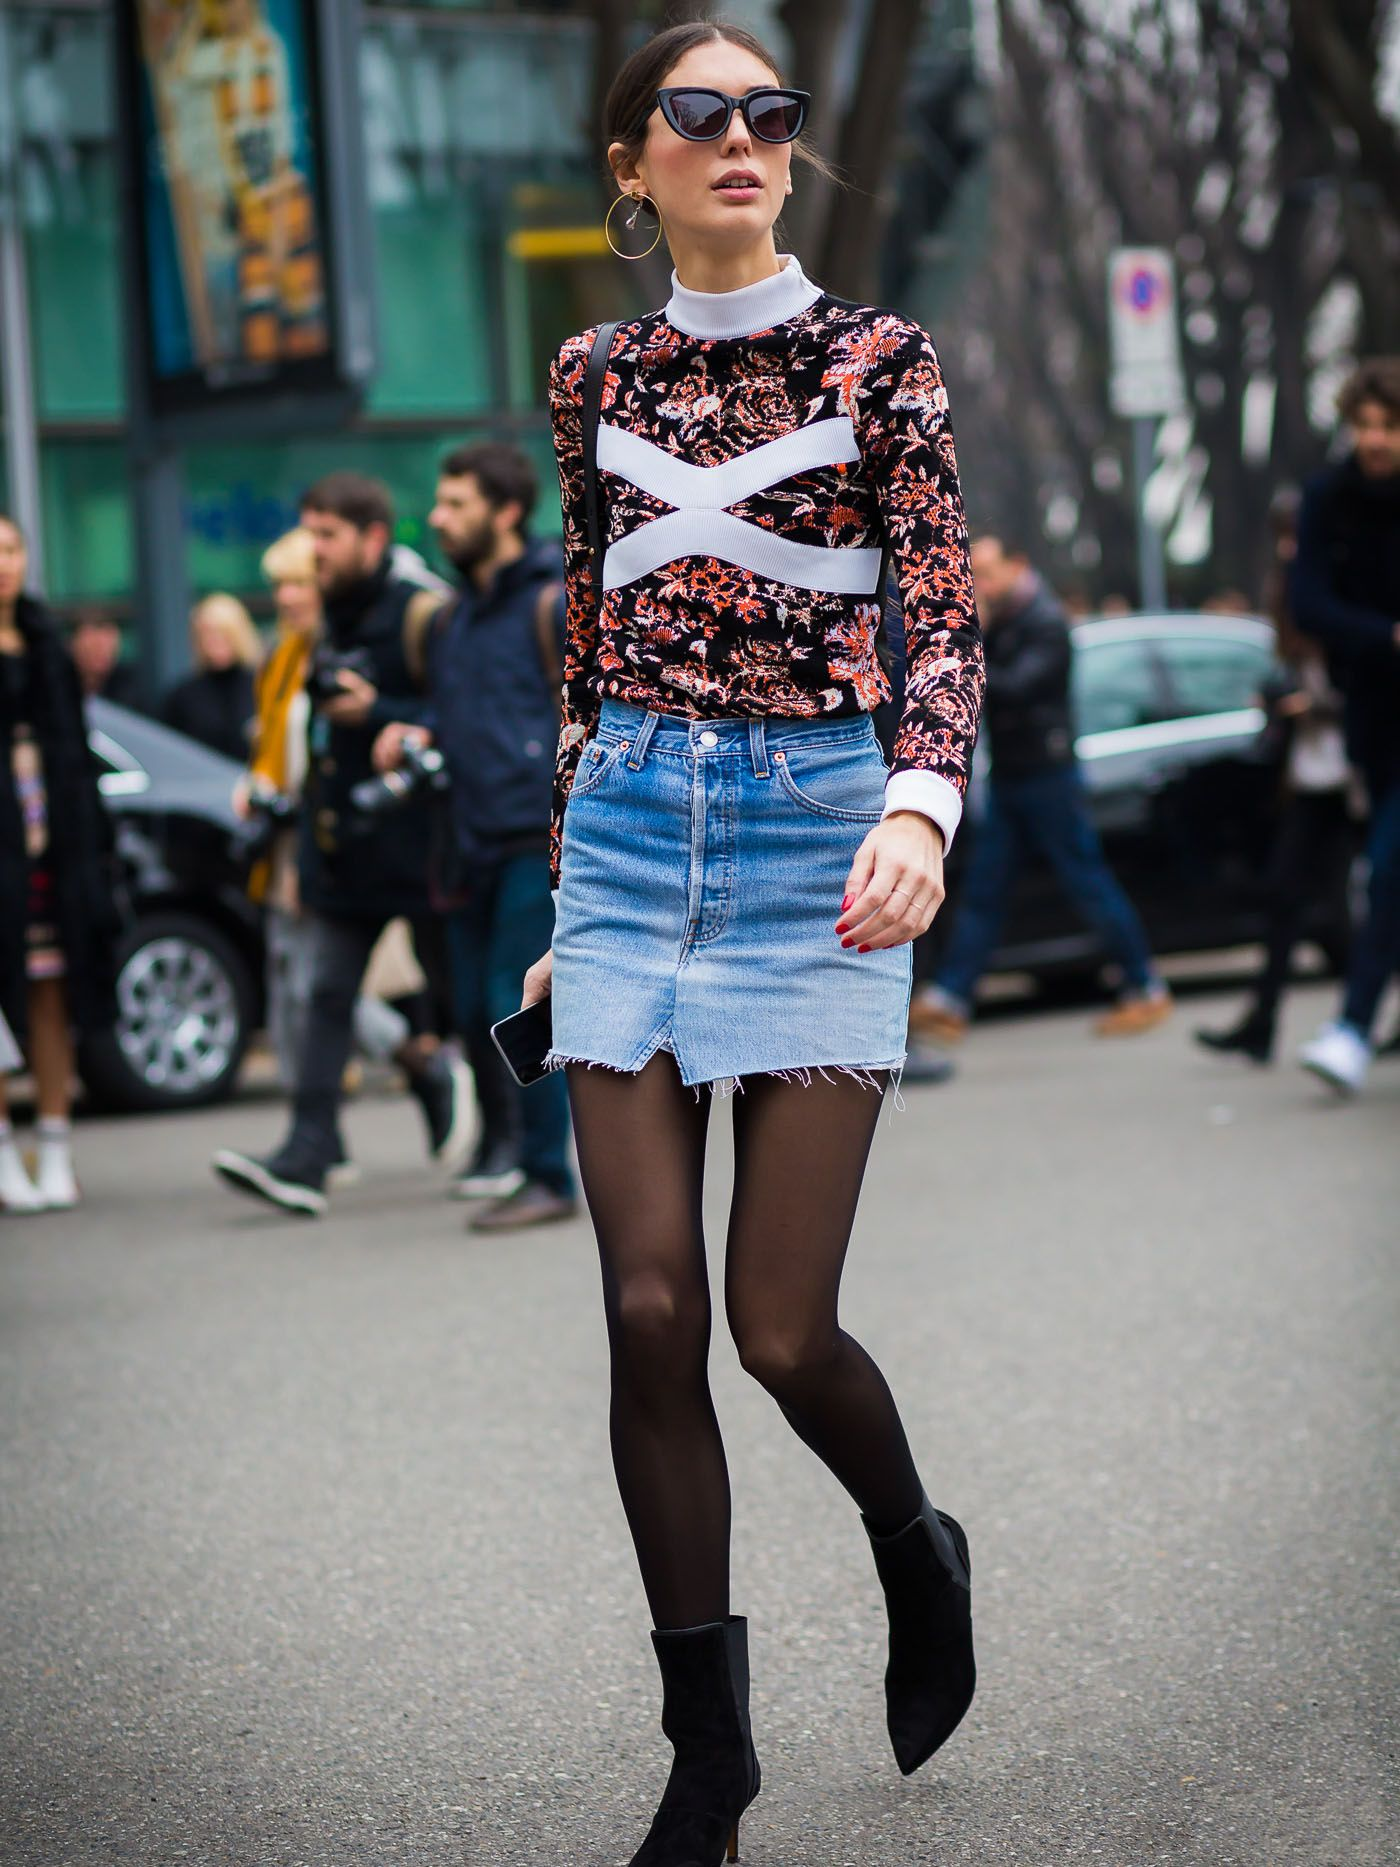 879c0552a winter-jean-skirt-outfits-269347-1538940112778-promo.1400x1867uc.jpg?ssl=1